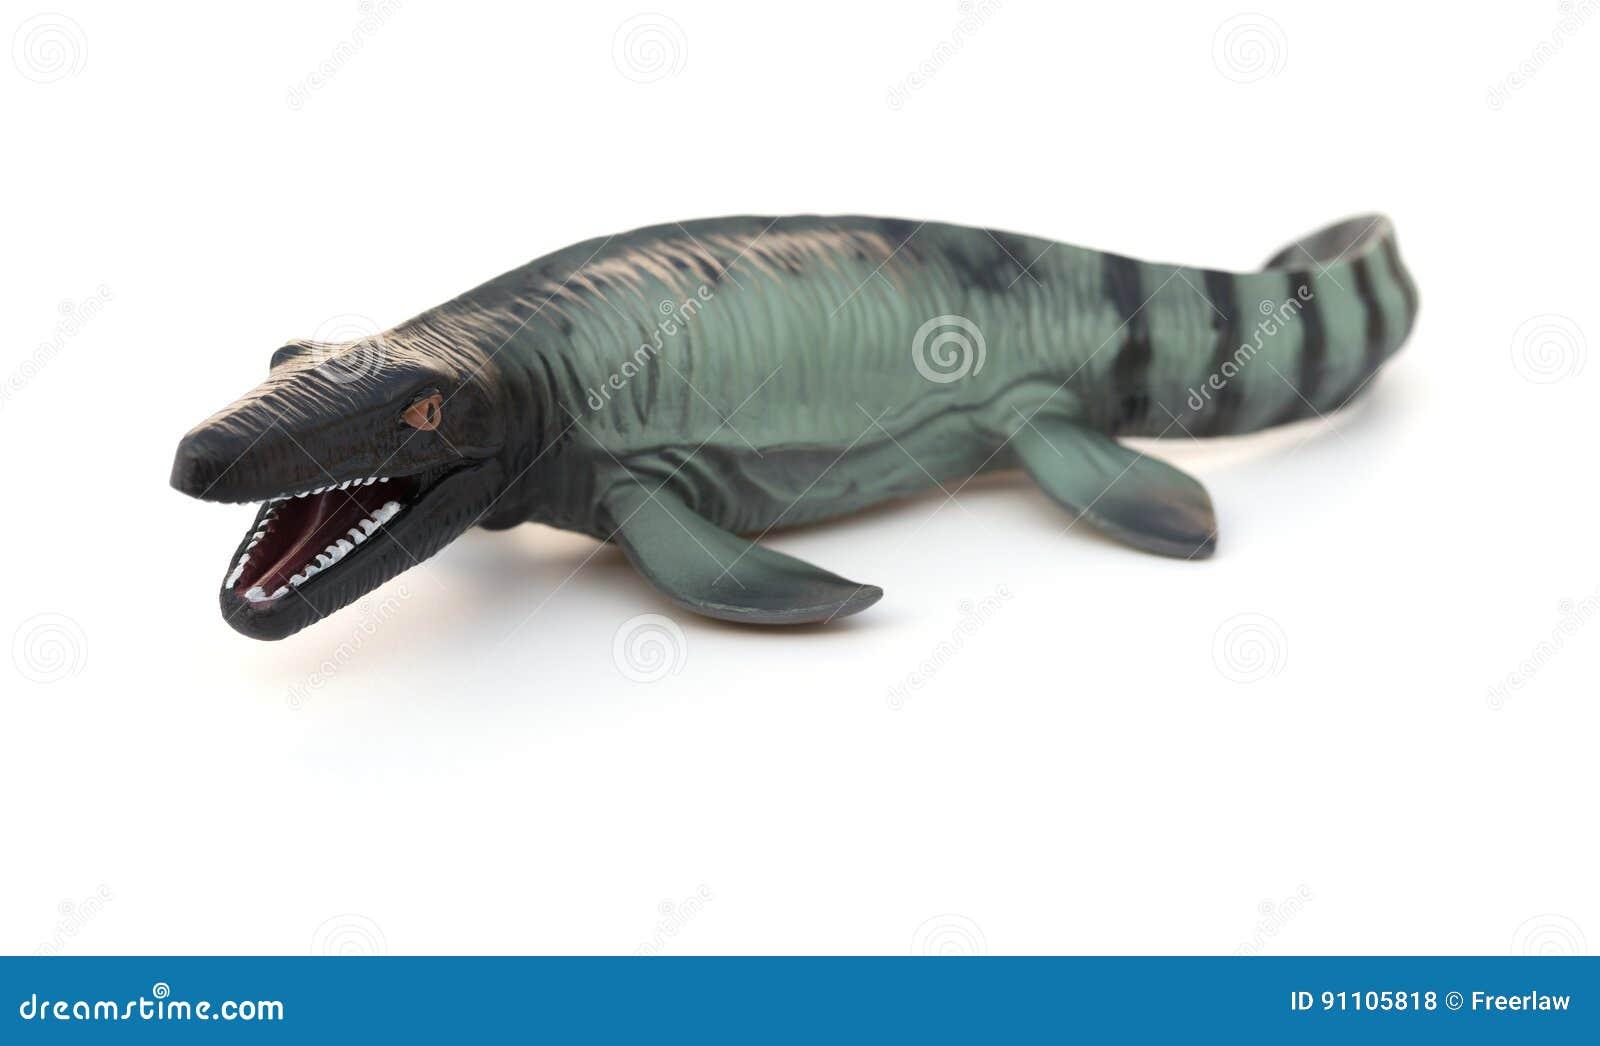 Mosasaurus toy on white